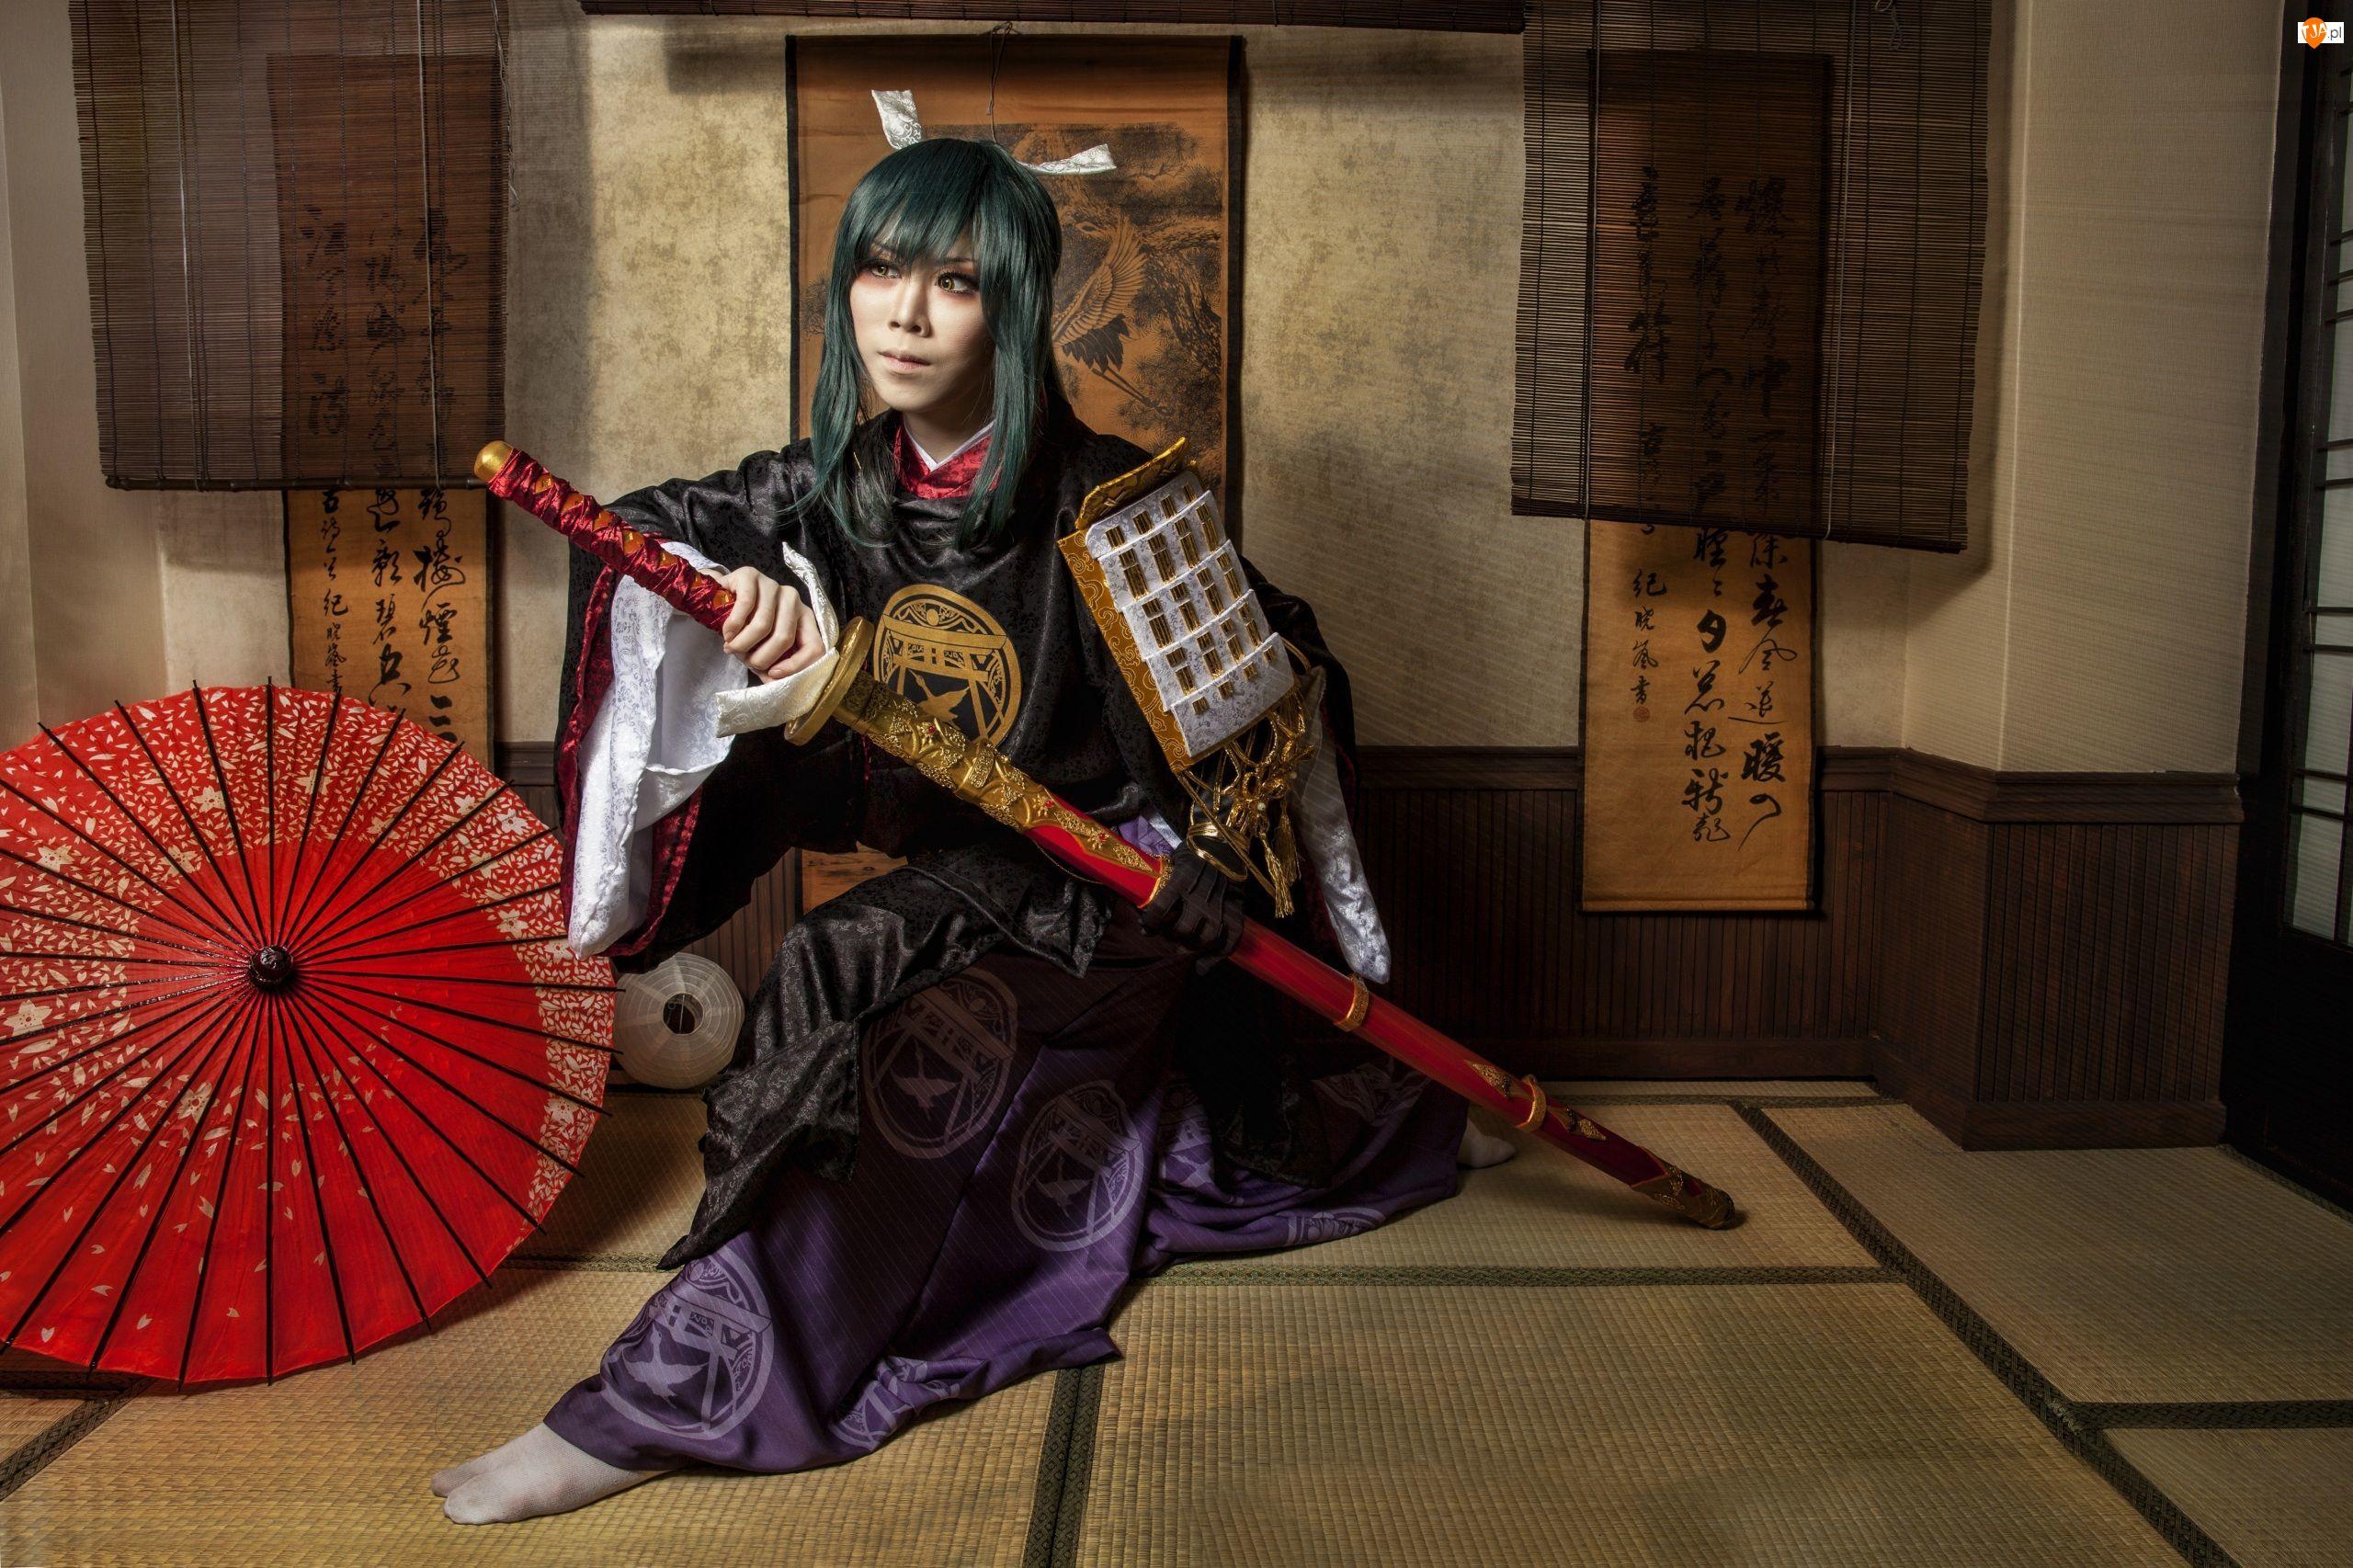 Kimono, Katana, Kobieta, Parasolka, Samuraj, Miecz